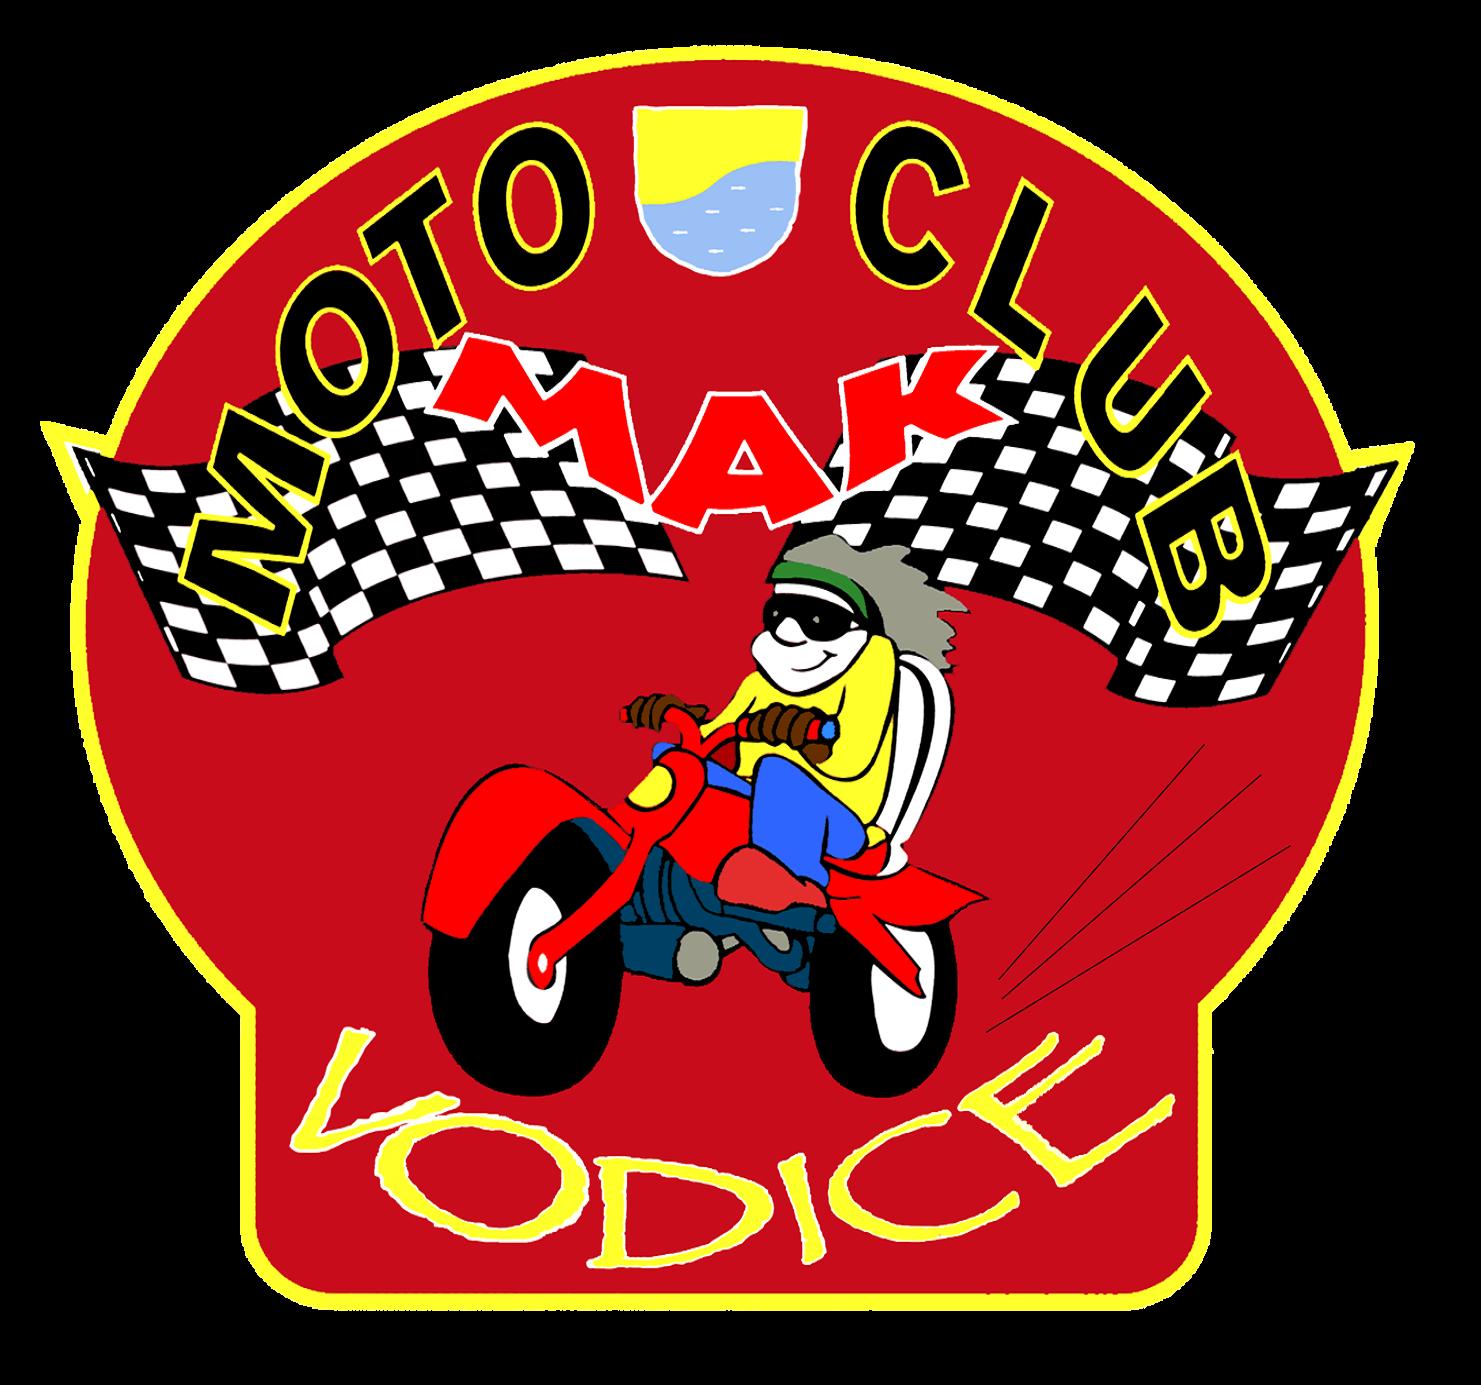 MOTO CLUB MAK